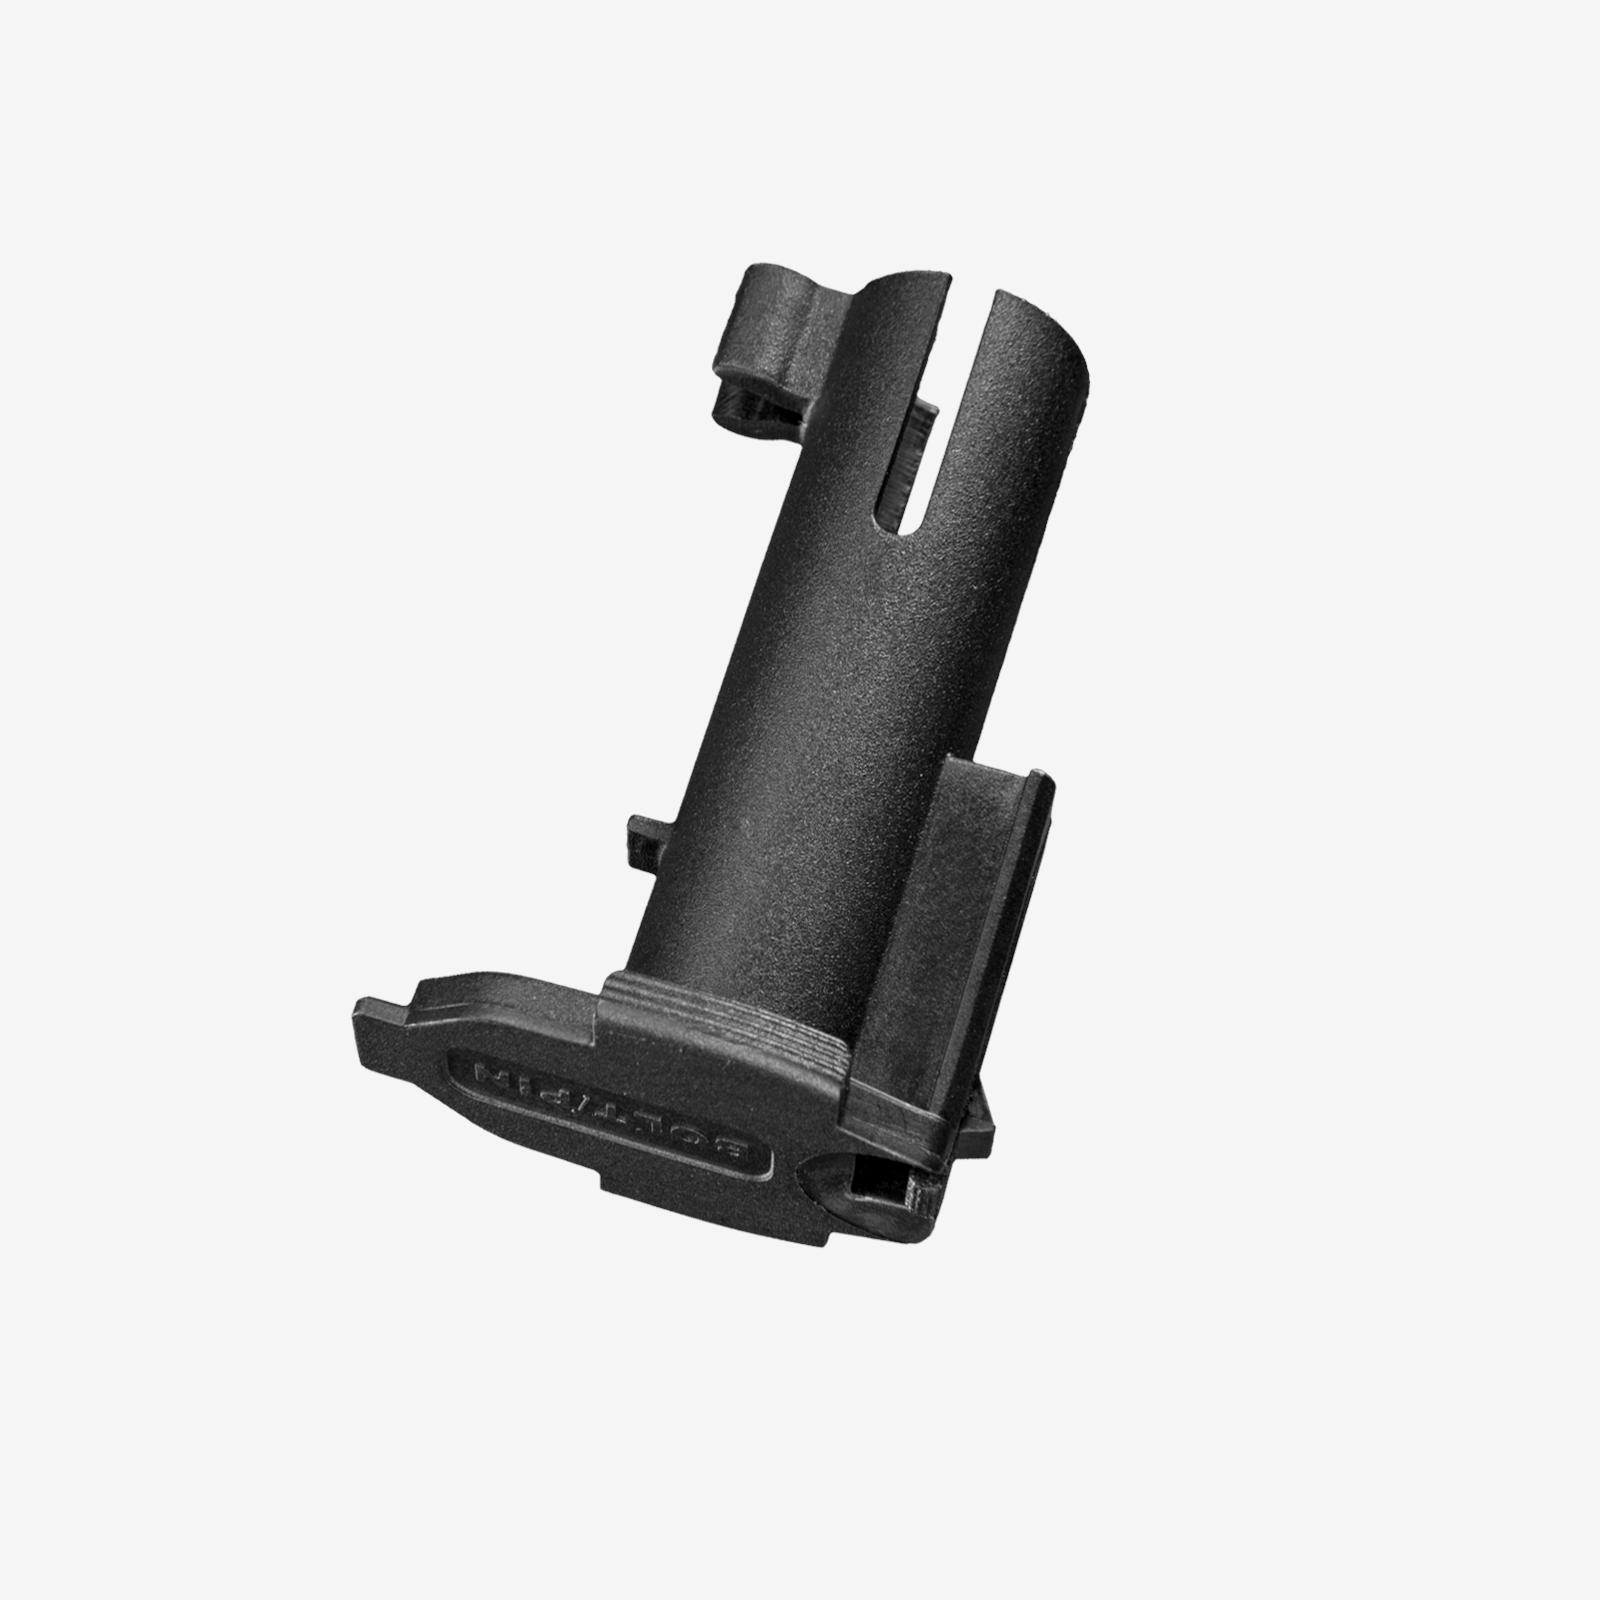 MIAD/MOE 5.56 Bolt & Firing Pin Storage Core